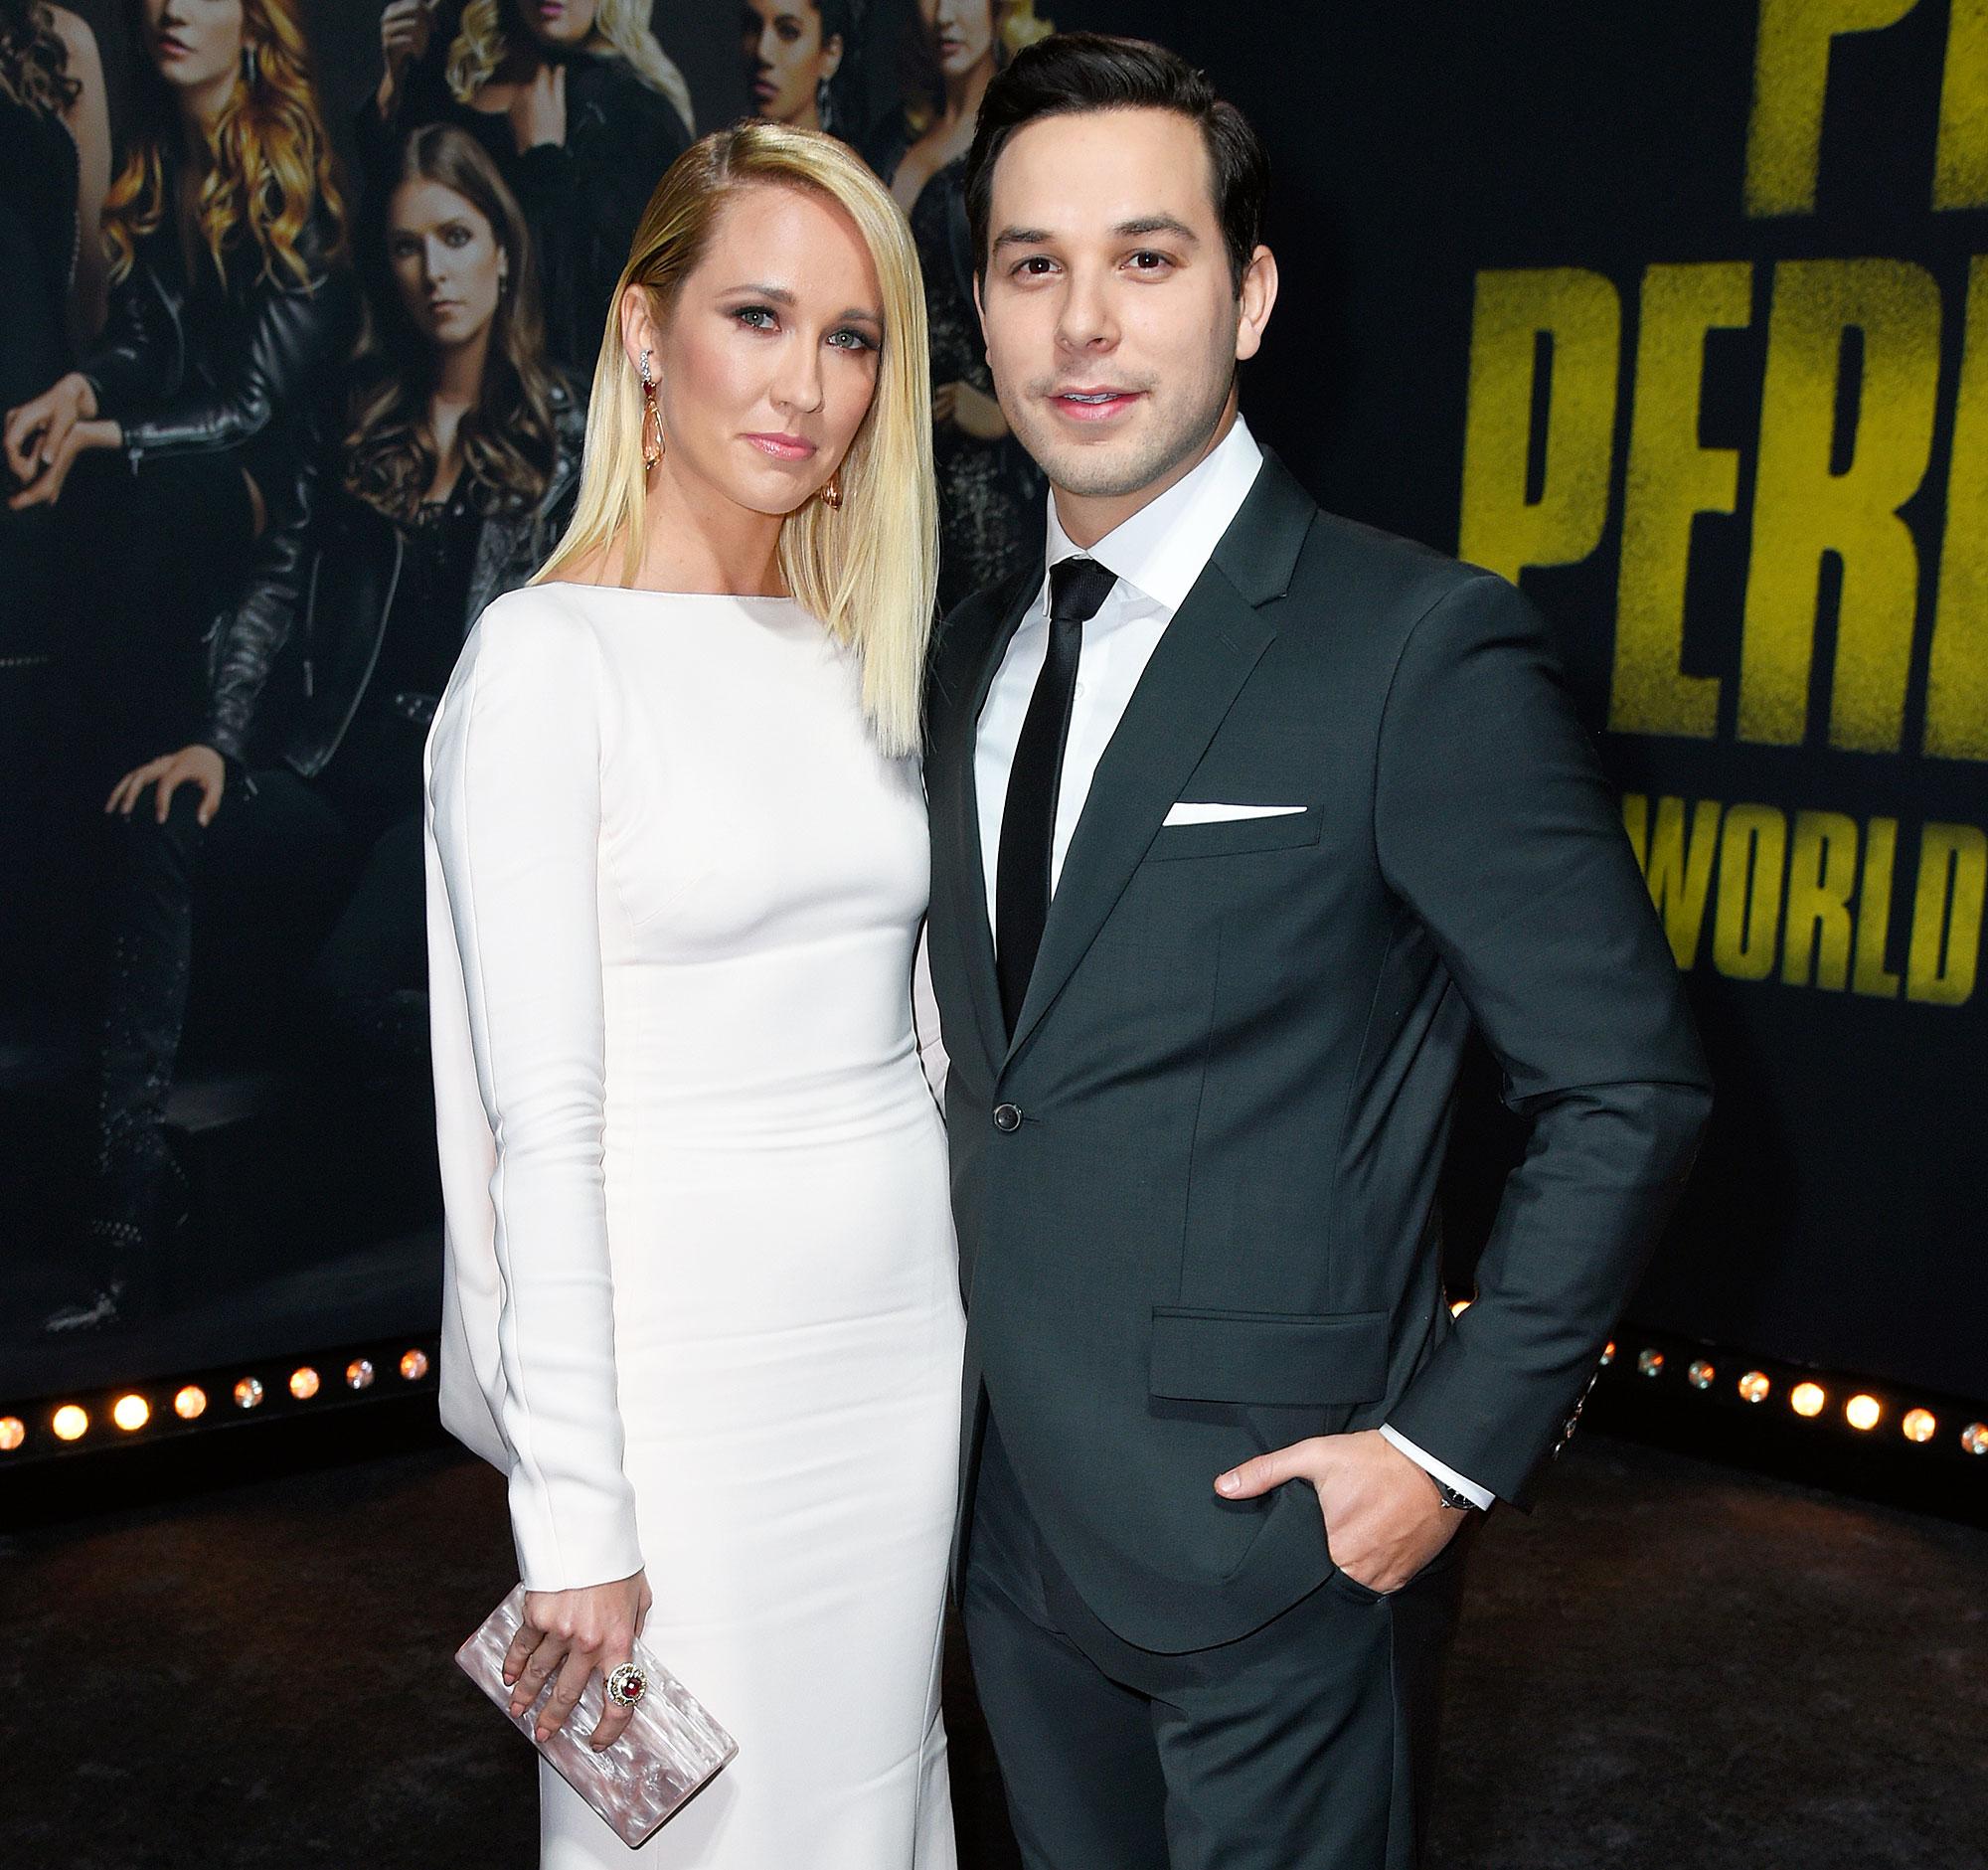 Anna Camp and Skylar Astin Finalize Divorce